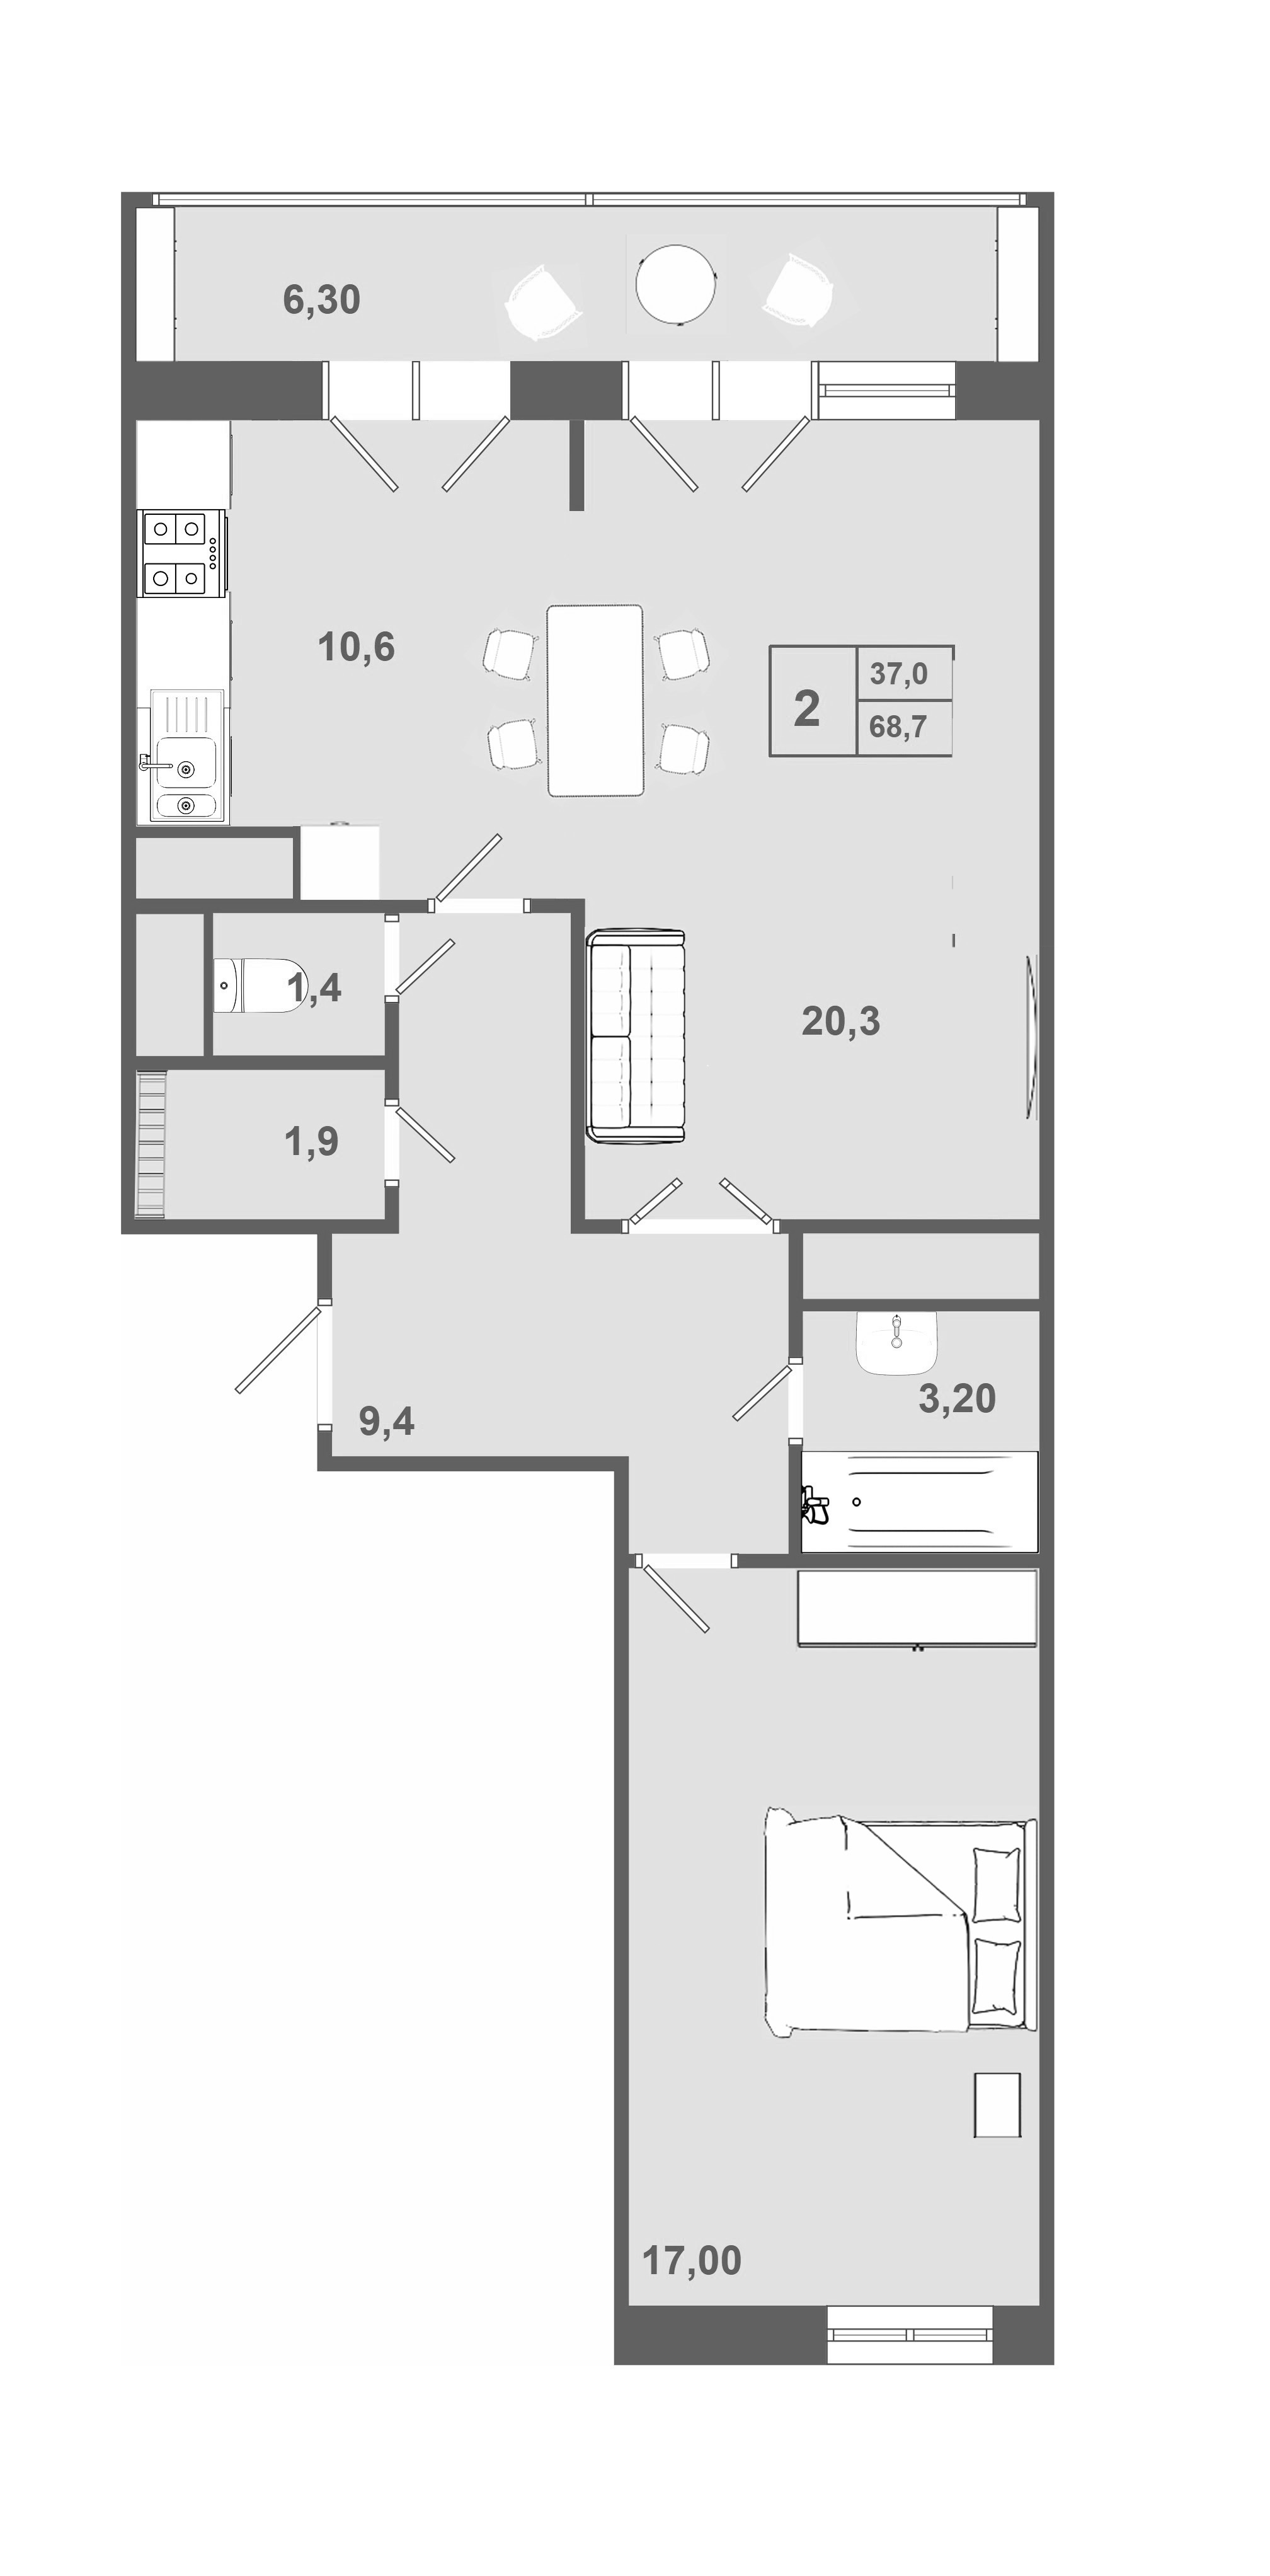 2Е-к.кв, 68.7 м²